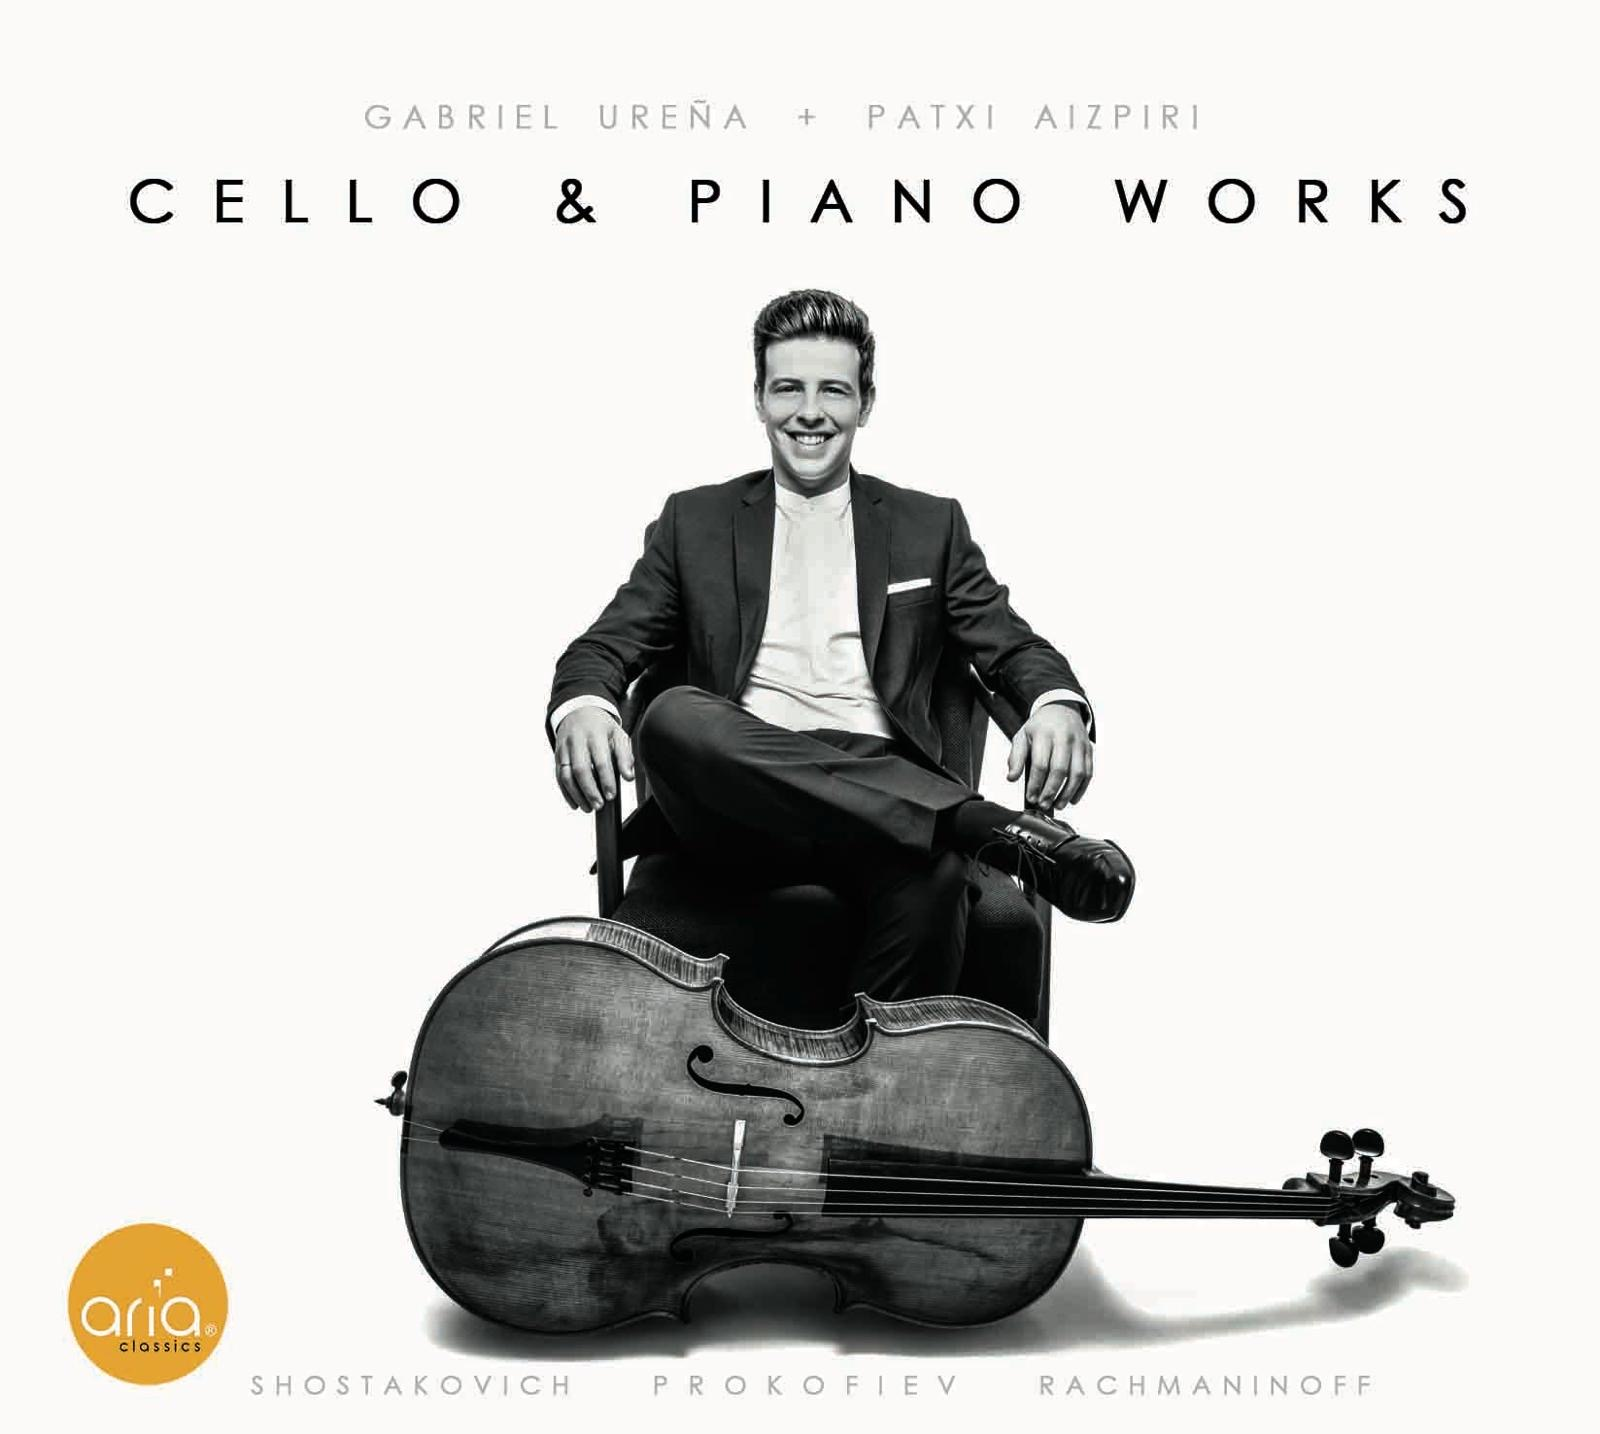 Cello & Piano Works Patxi Aizpiri & Gabriel Ureña